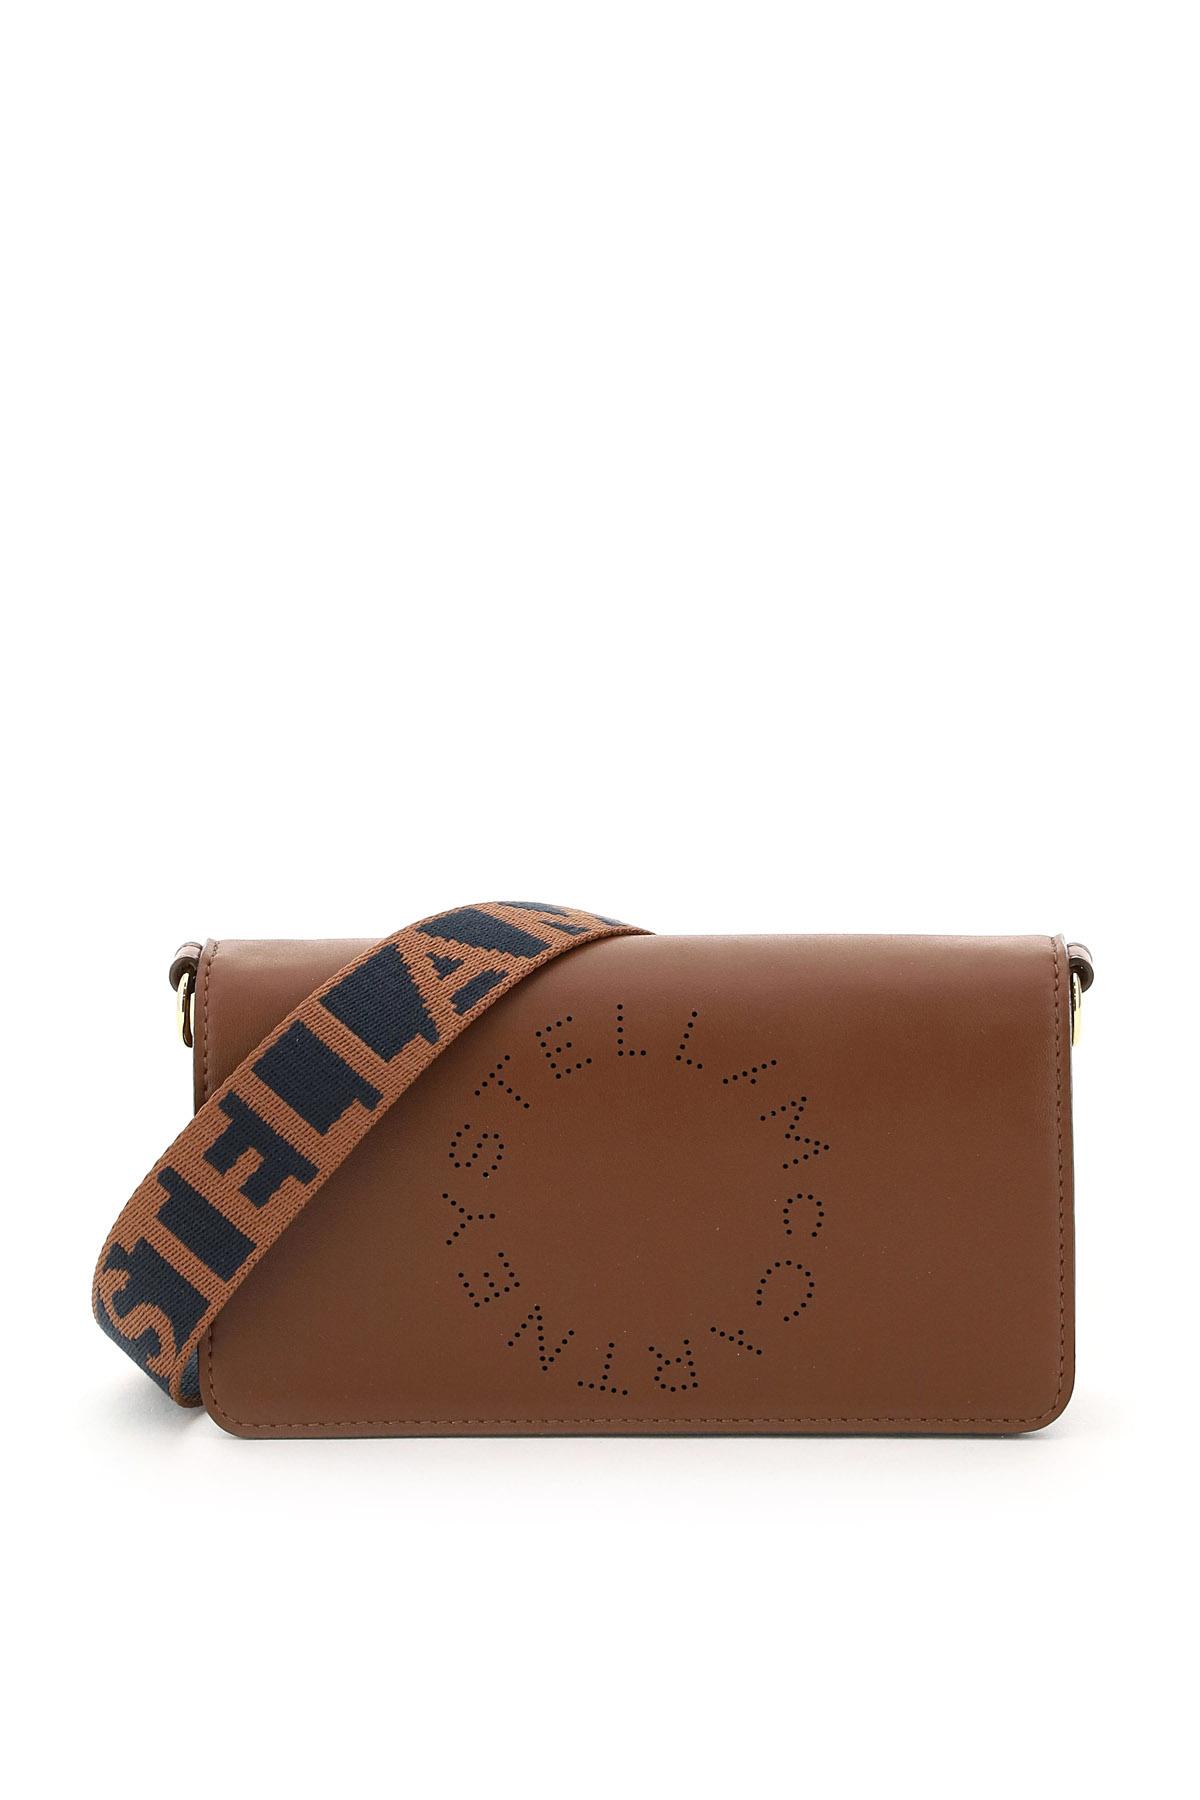 Stella mccartney mini bag crossbody stella logo